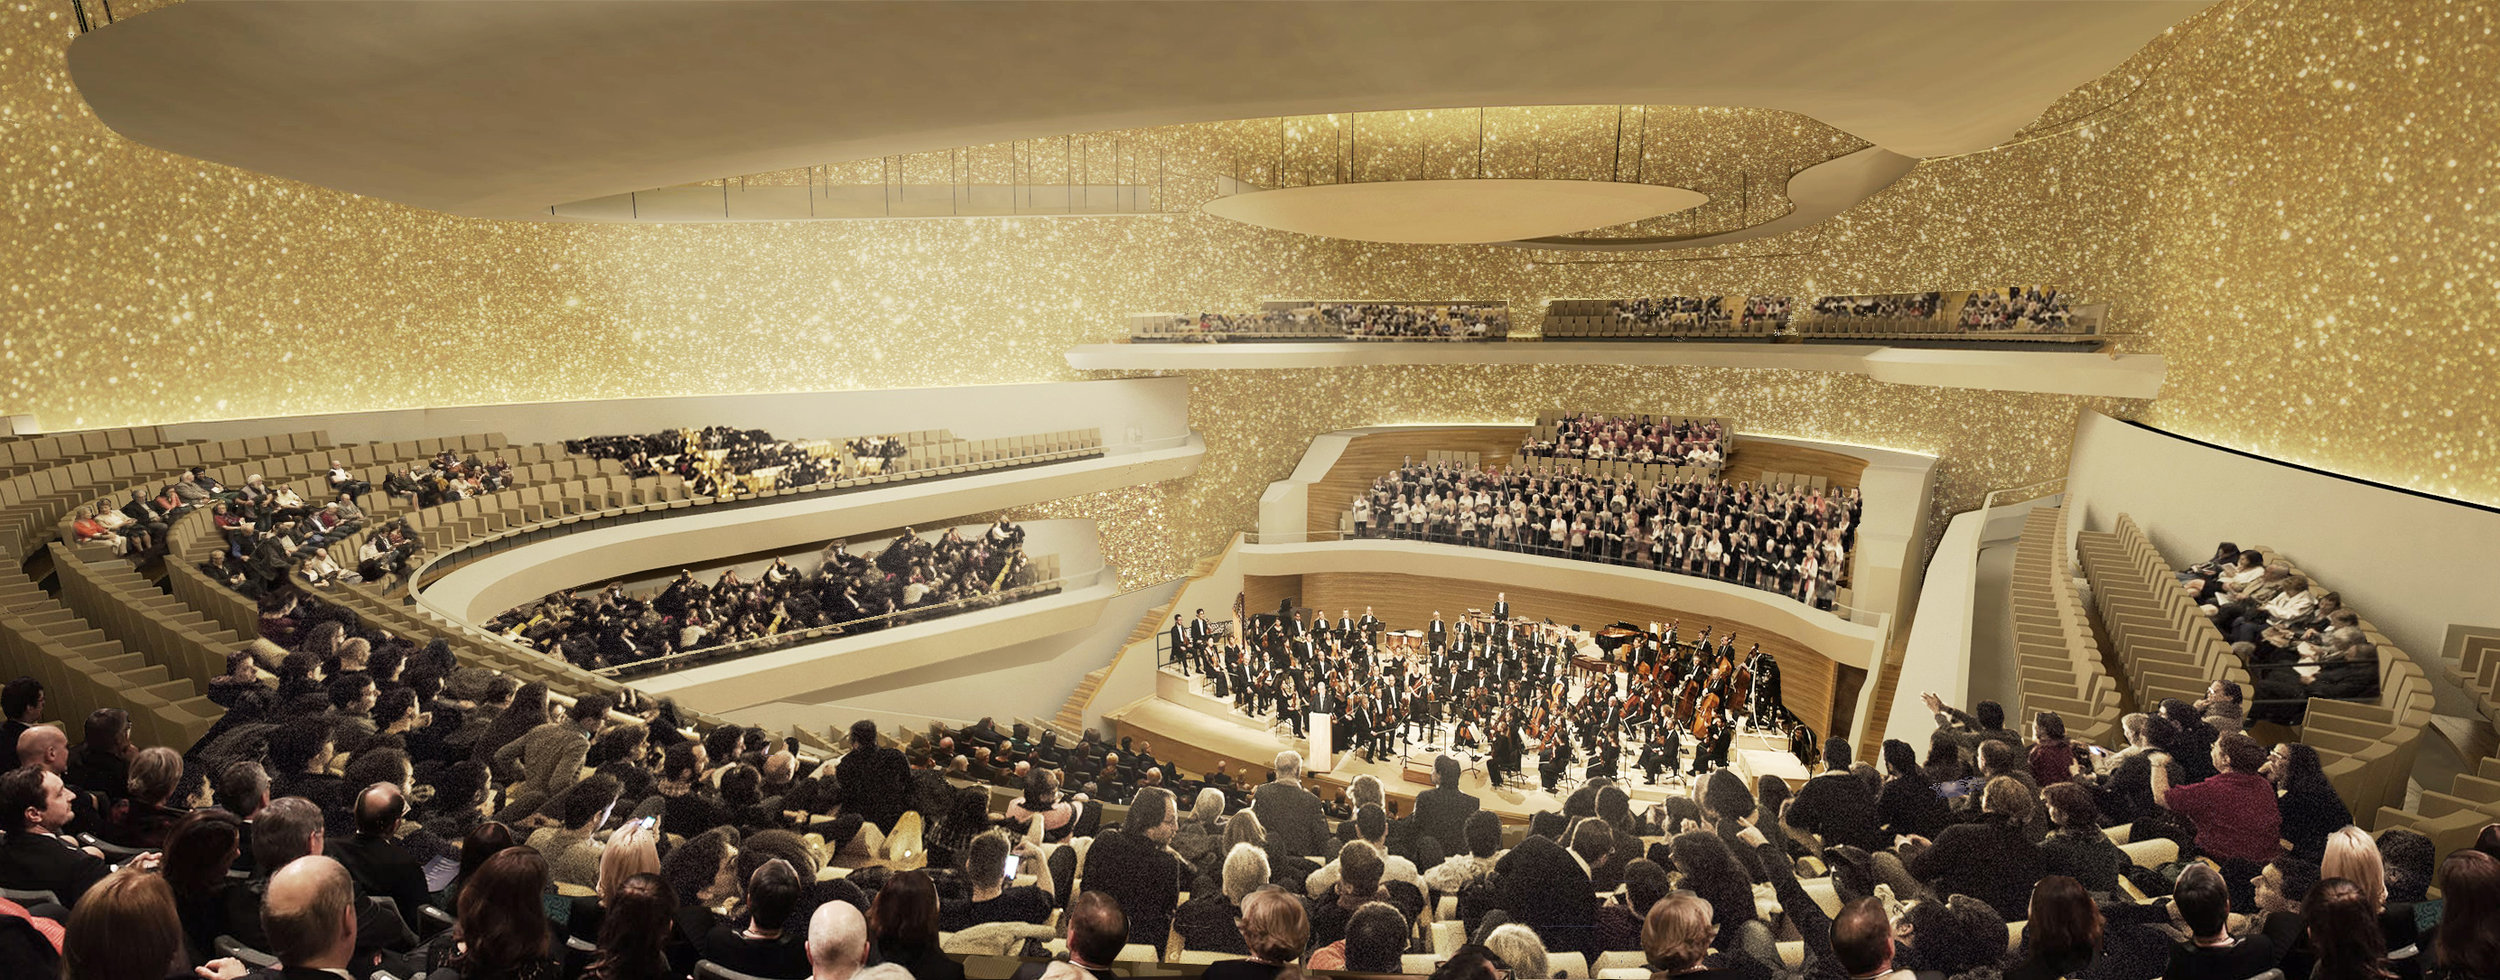 Main Concert Hall.